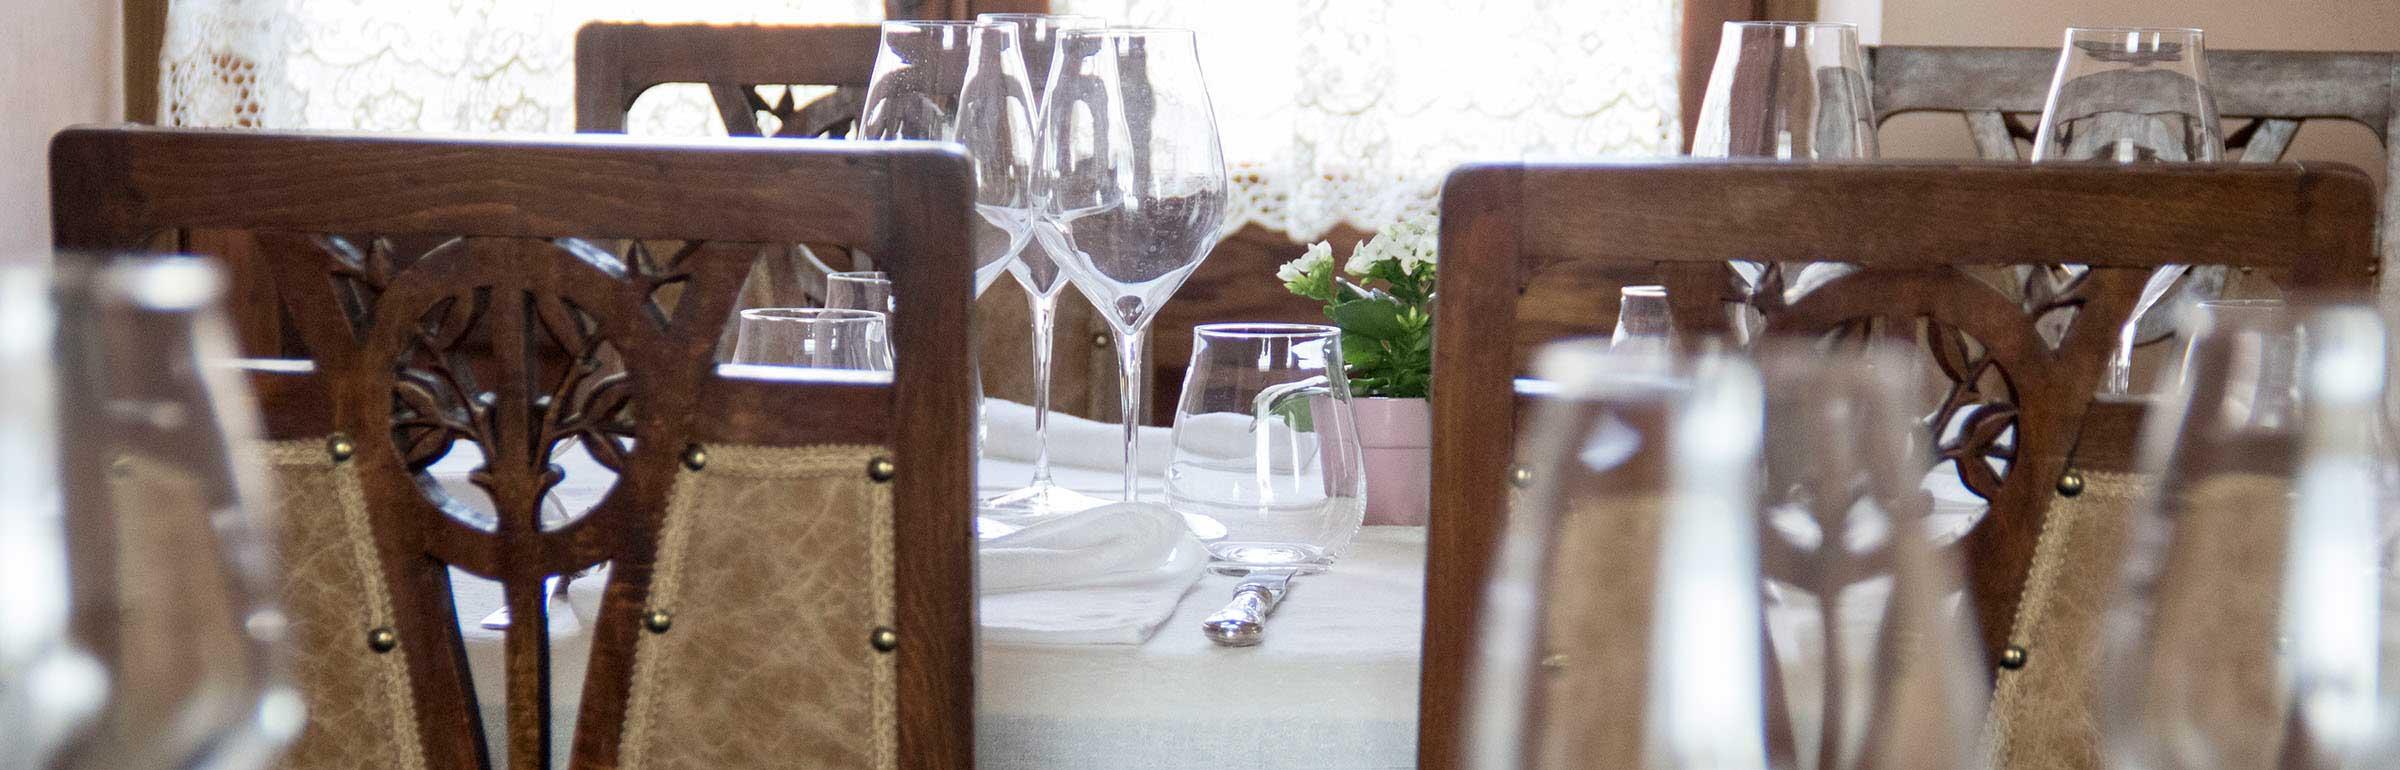 Tavola liberty ristorante Le Jardin Fleuri Gusti Liberty